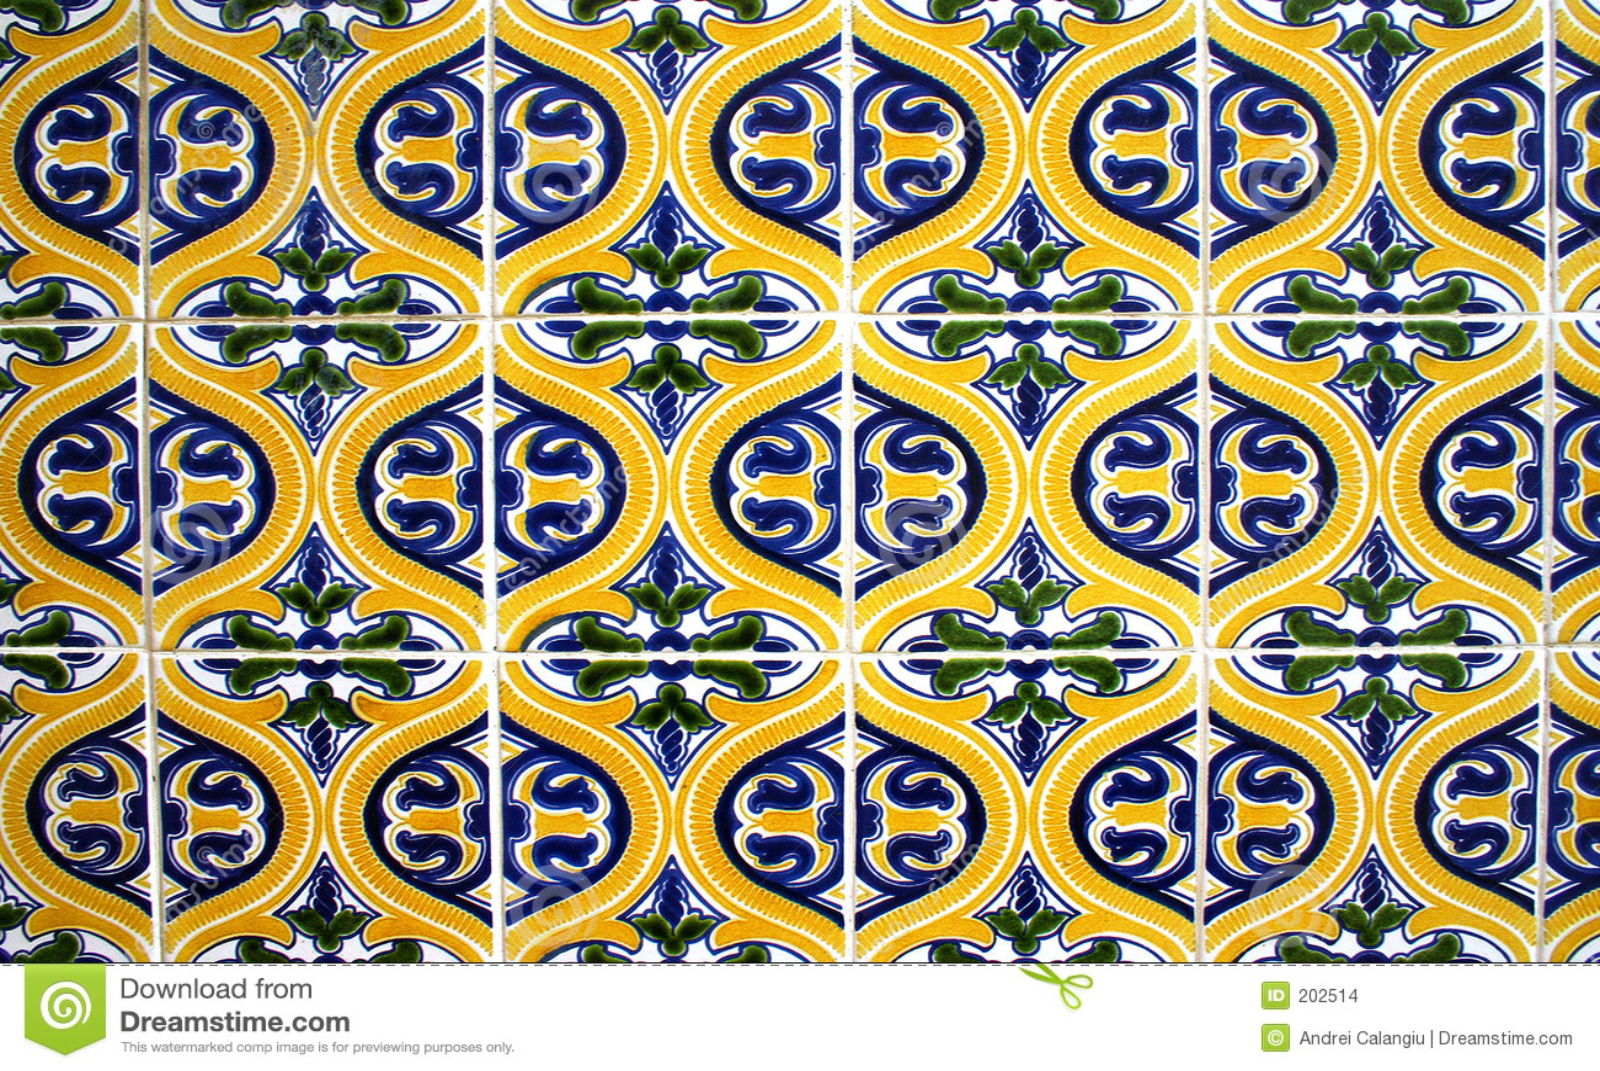 download comp - Mosaik Muster